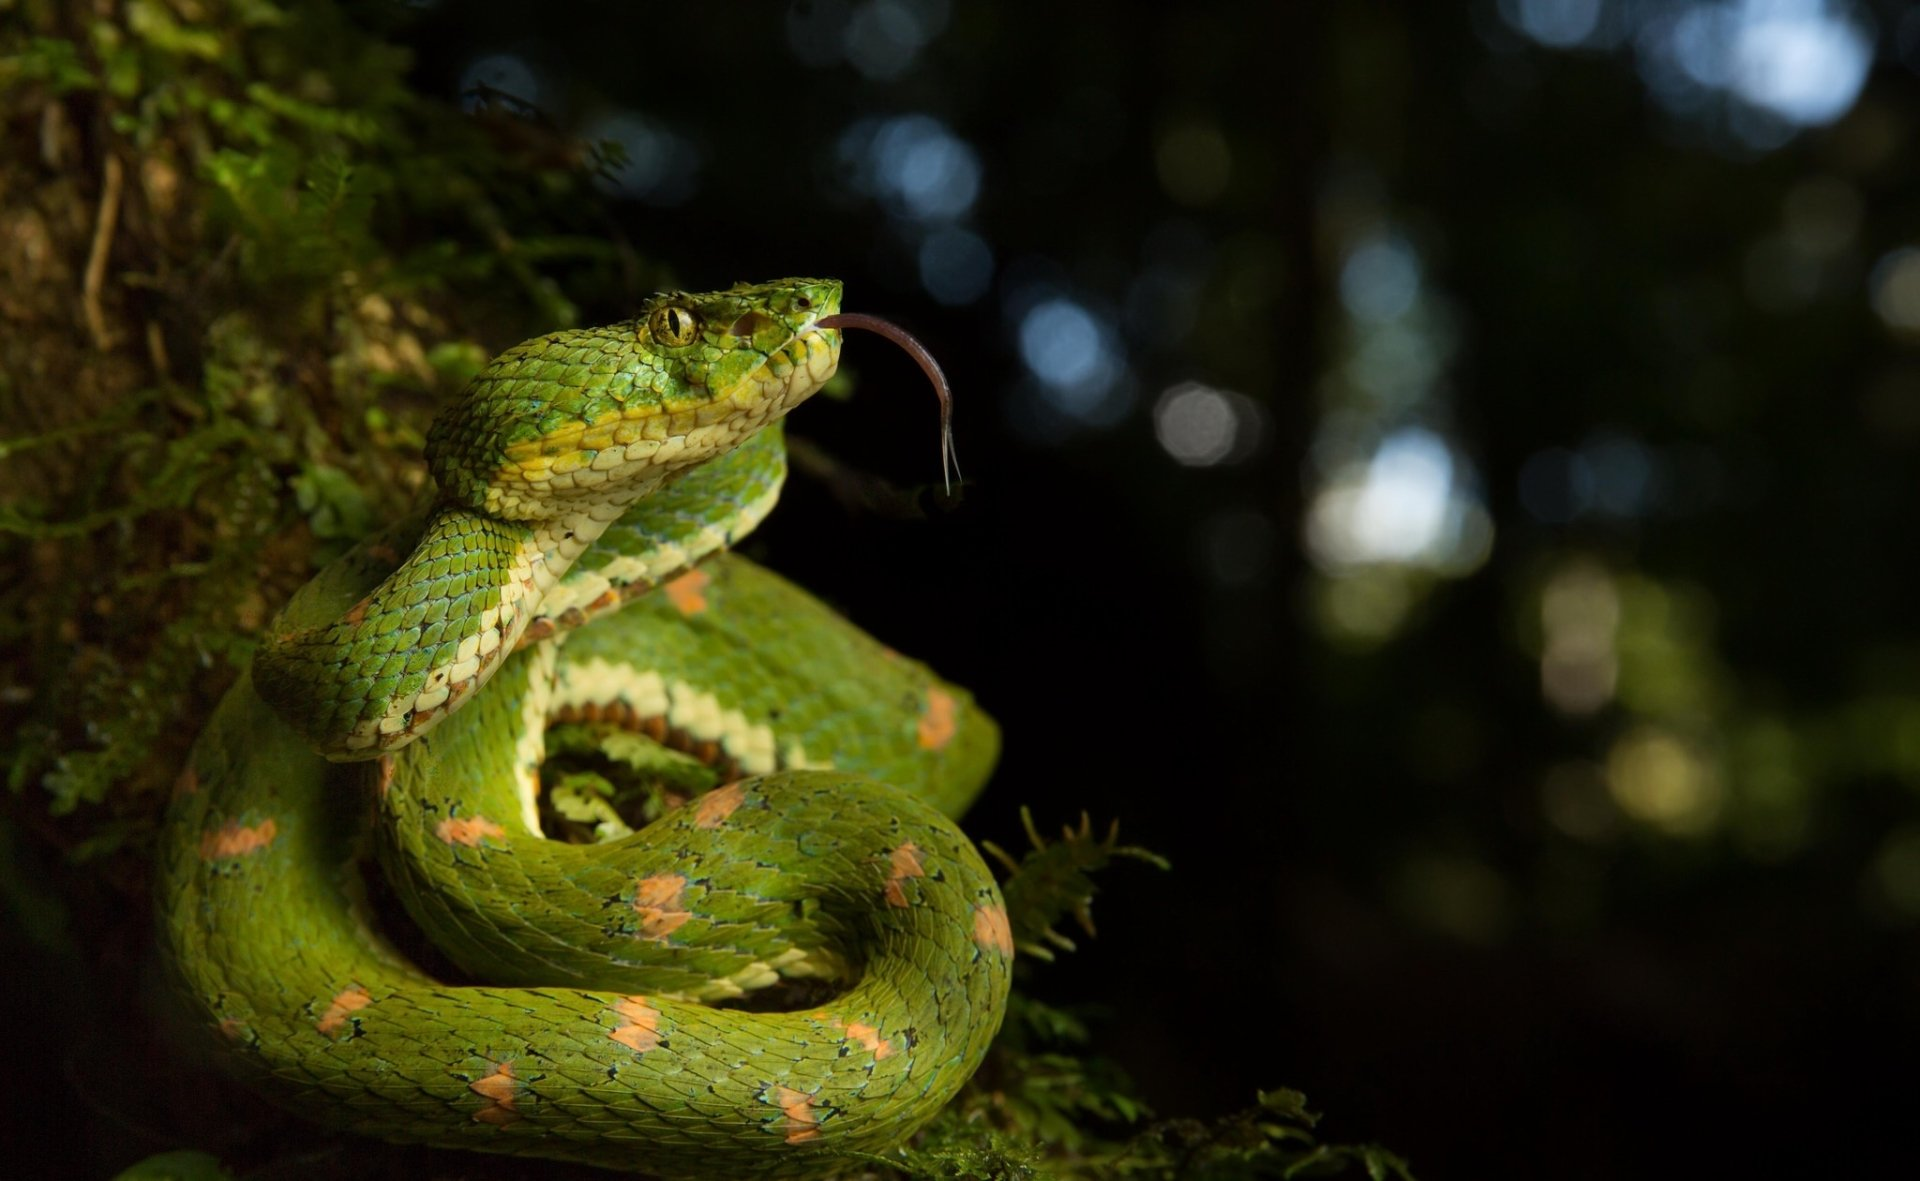 Animal - Viper  Snake Reptile Wildlife Bokeh Wallpaper